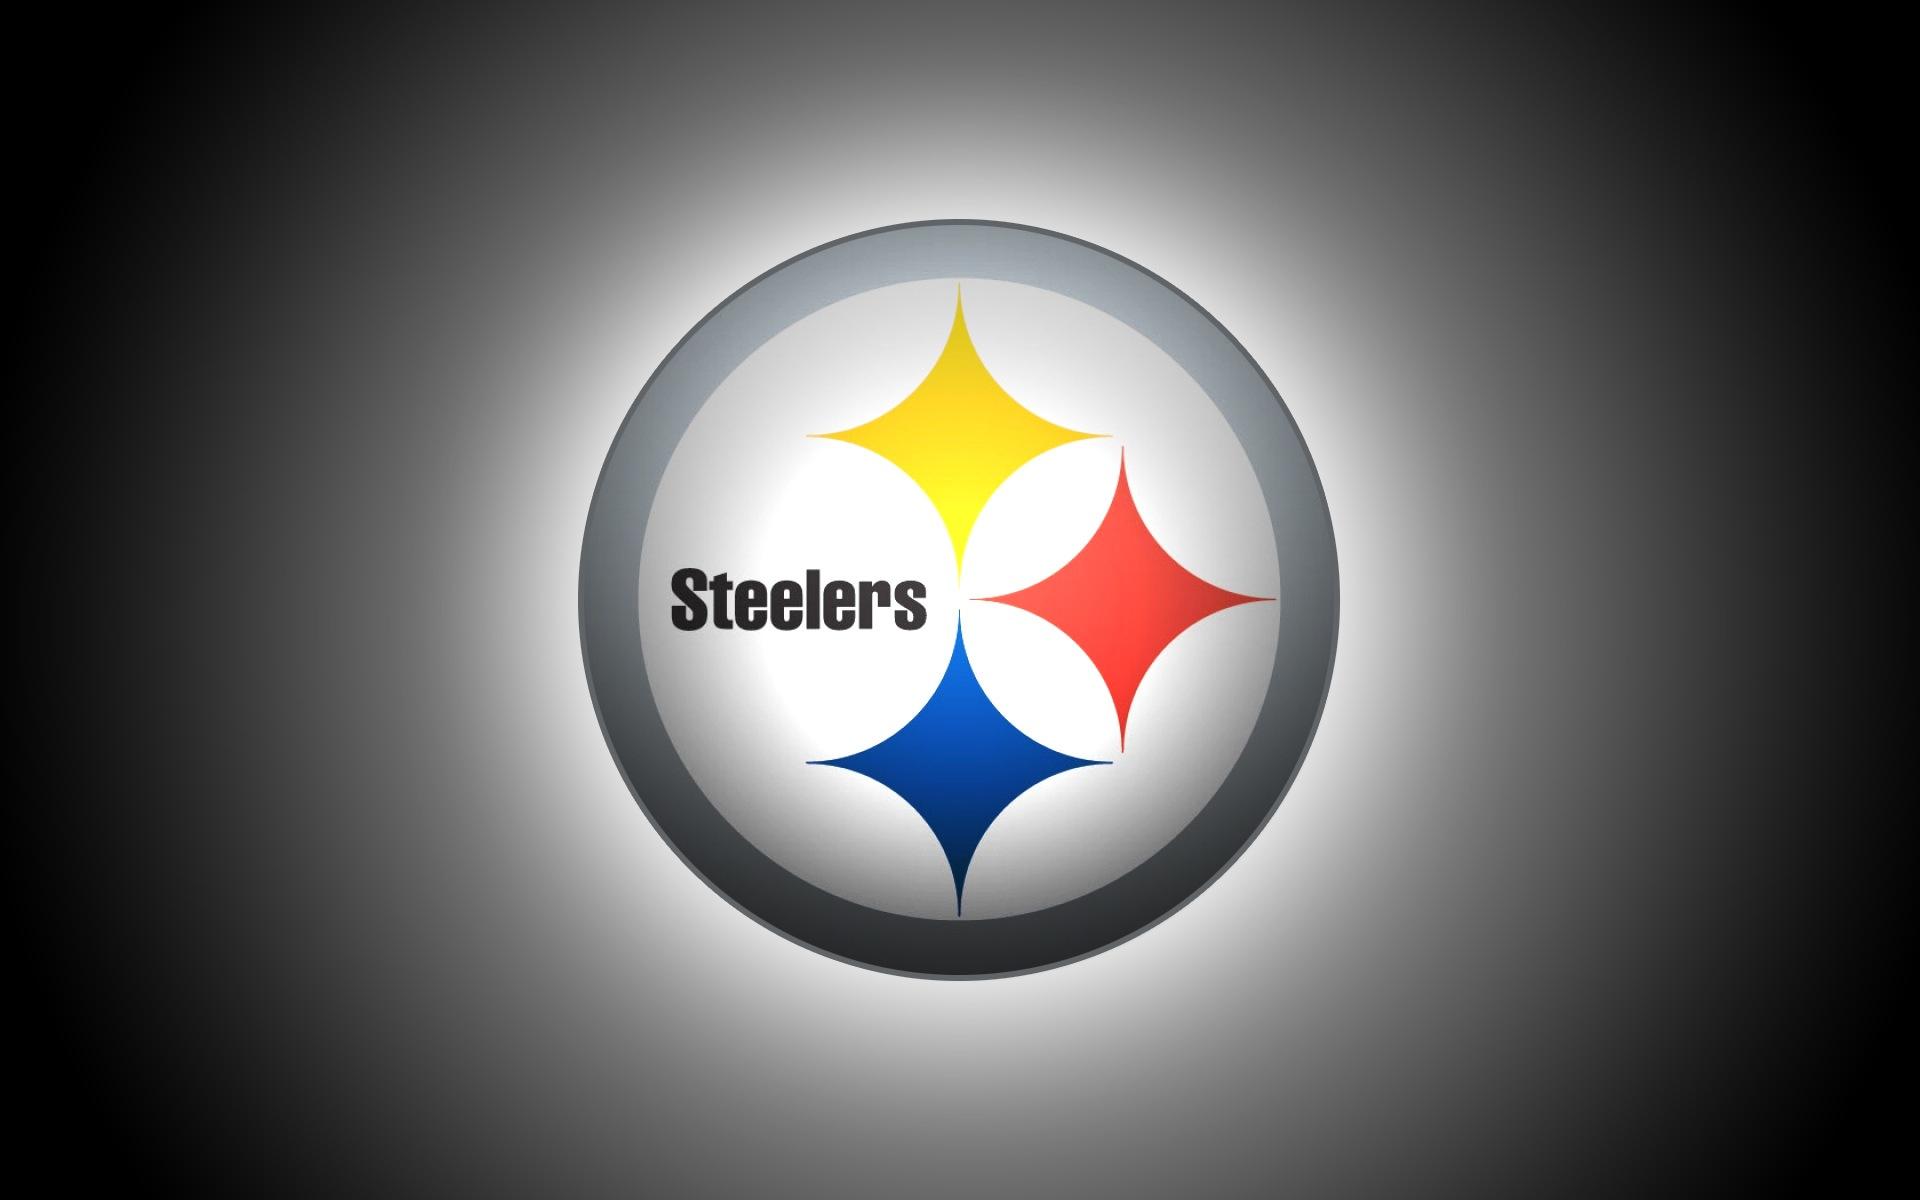 Steelers Wallpaper 1920x1200